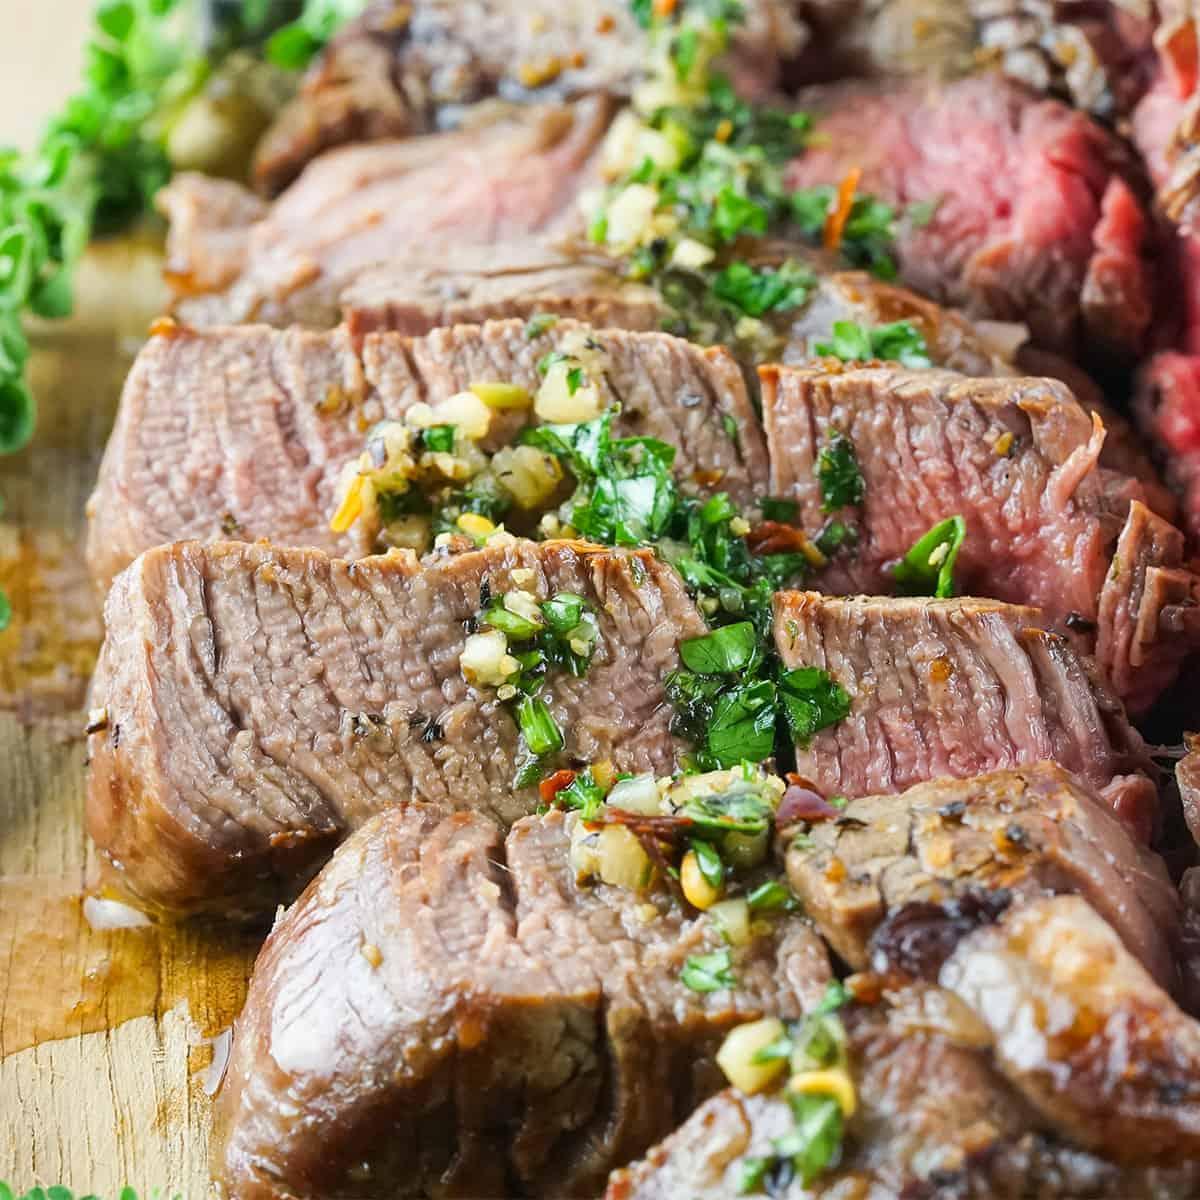 Slices of grilled porterhouse steak up close